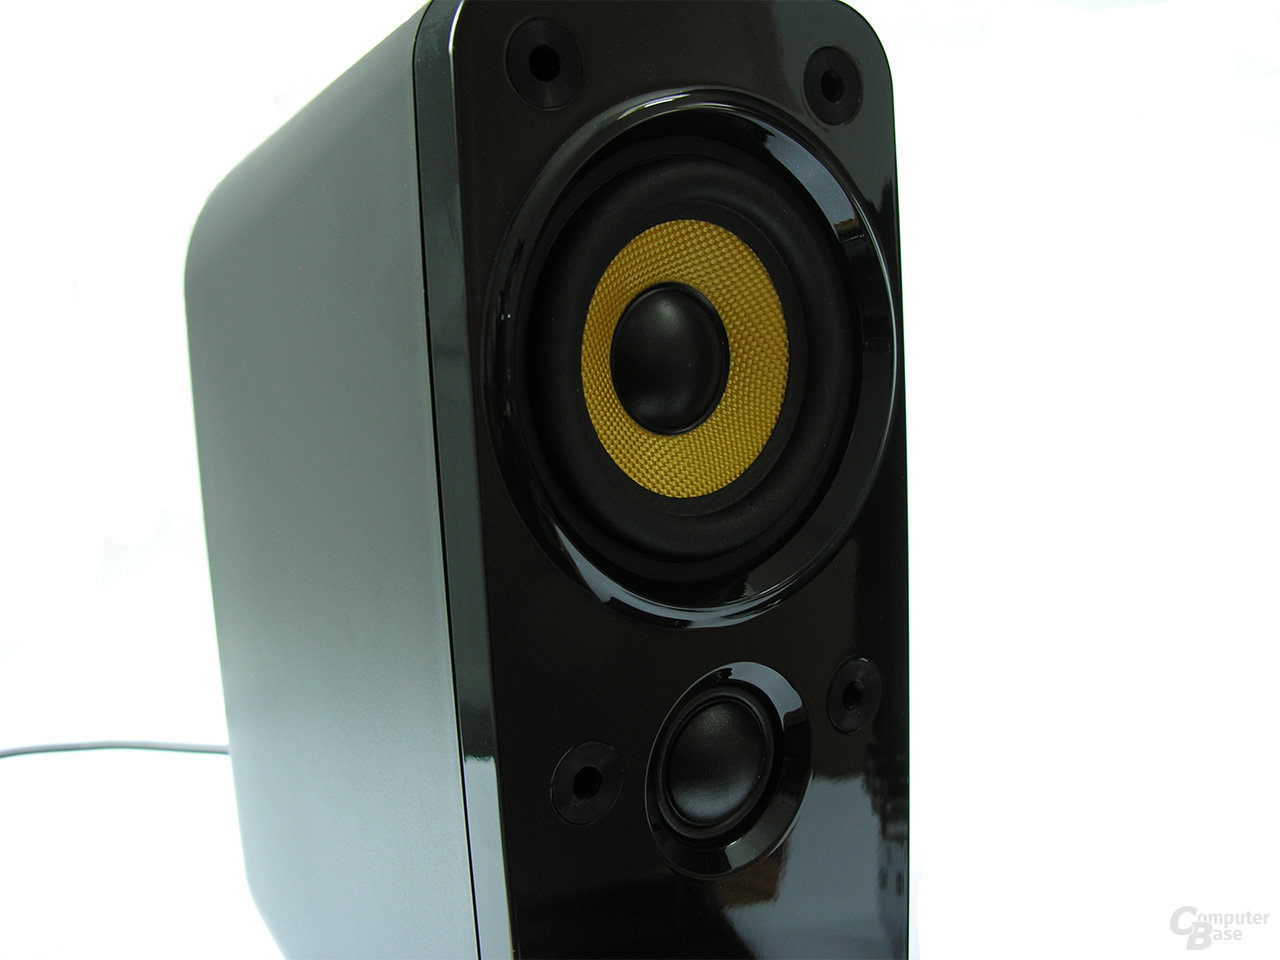 Lautsprecher ohne Schutzgitter